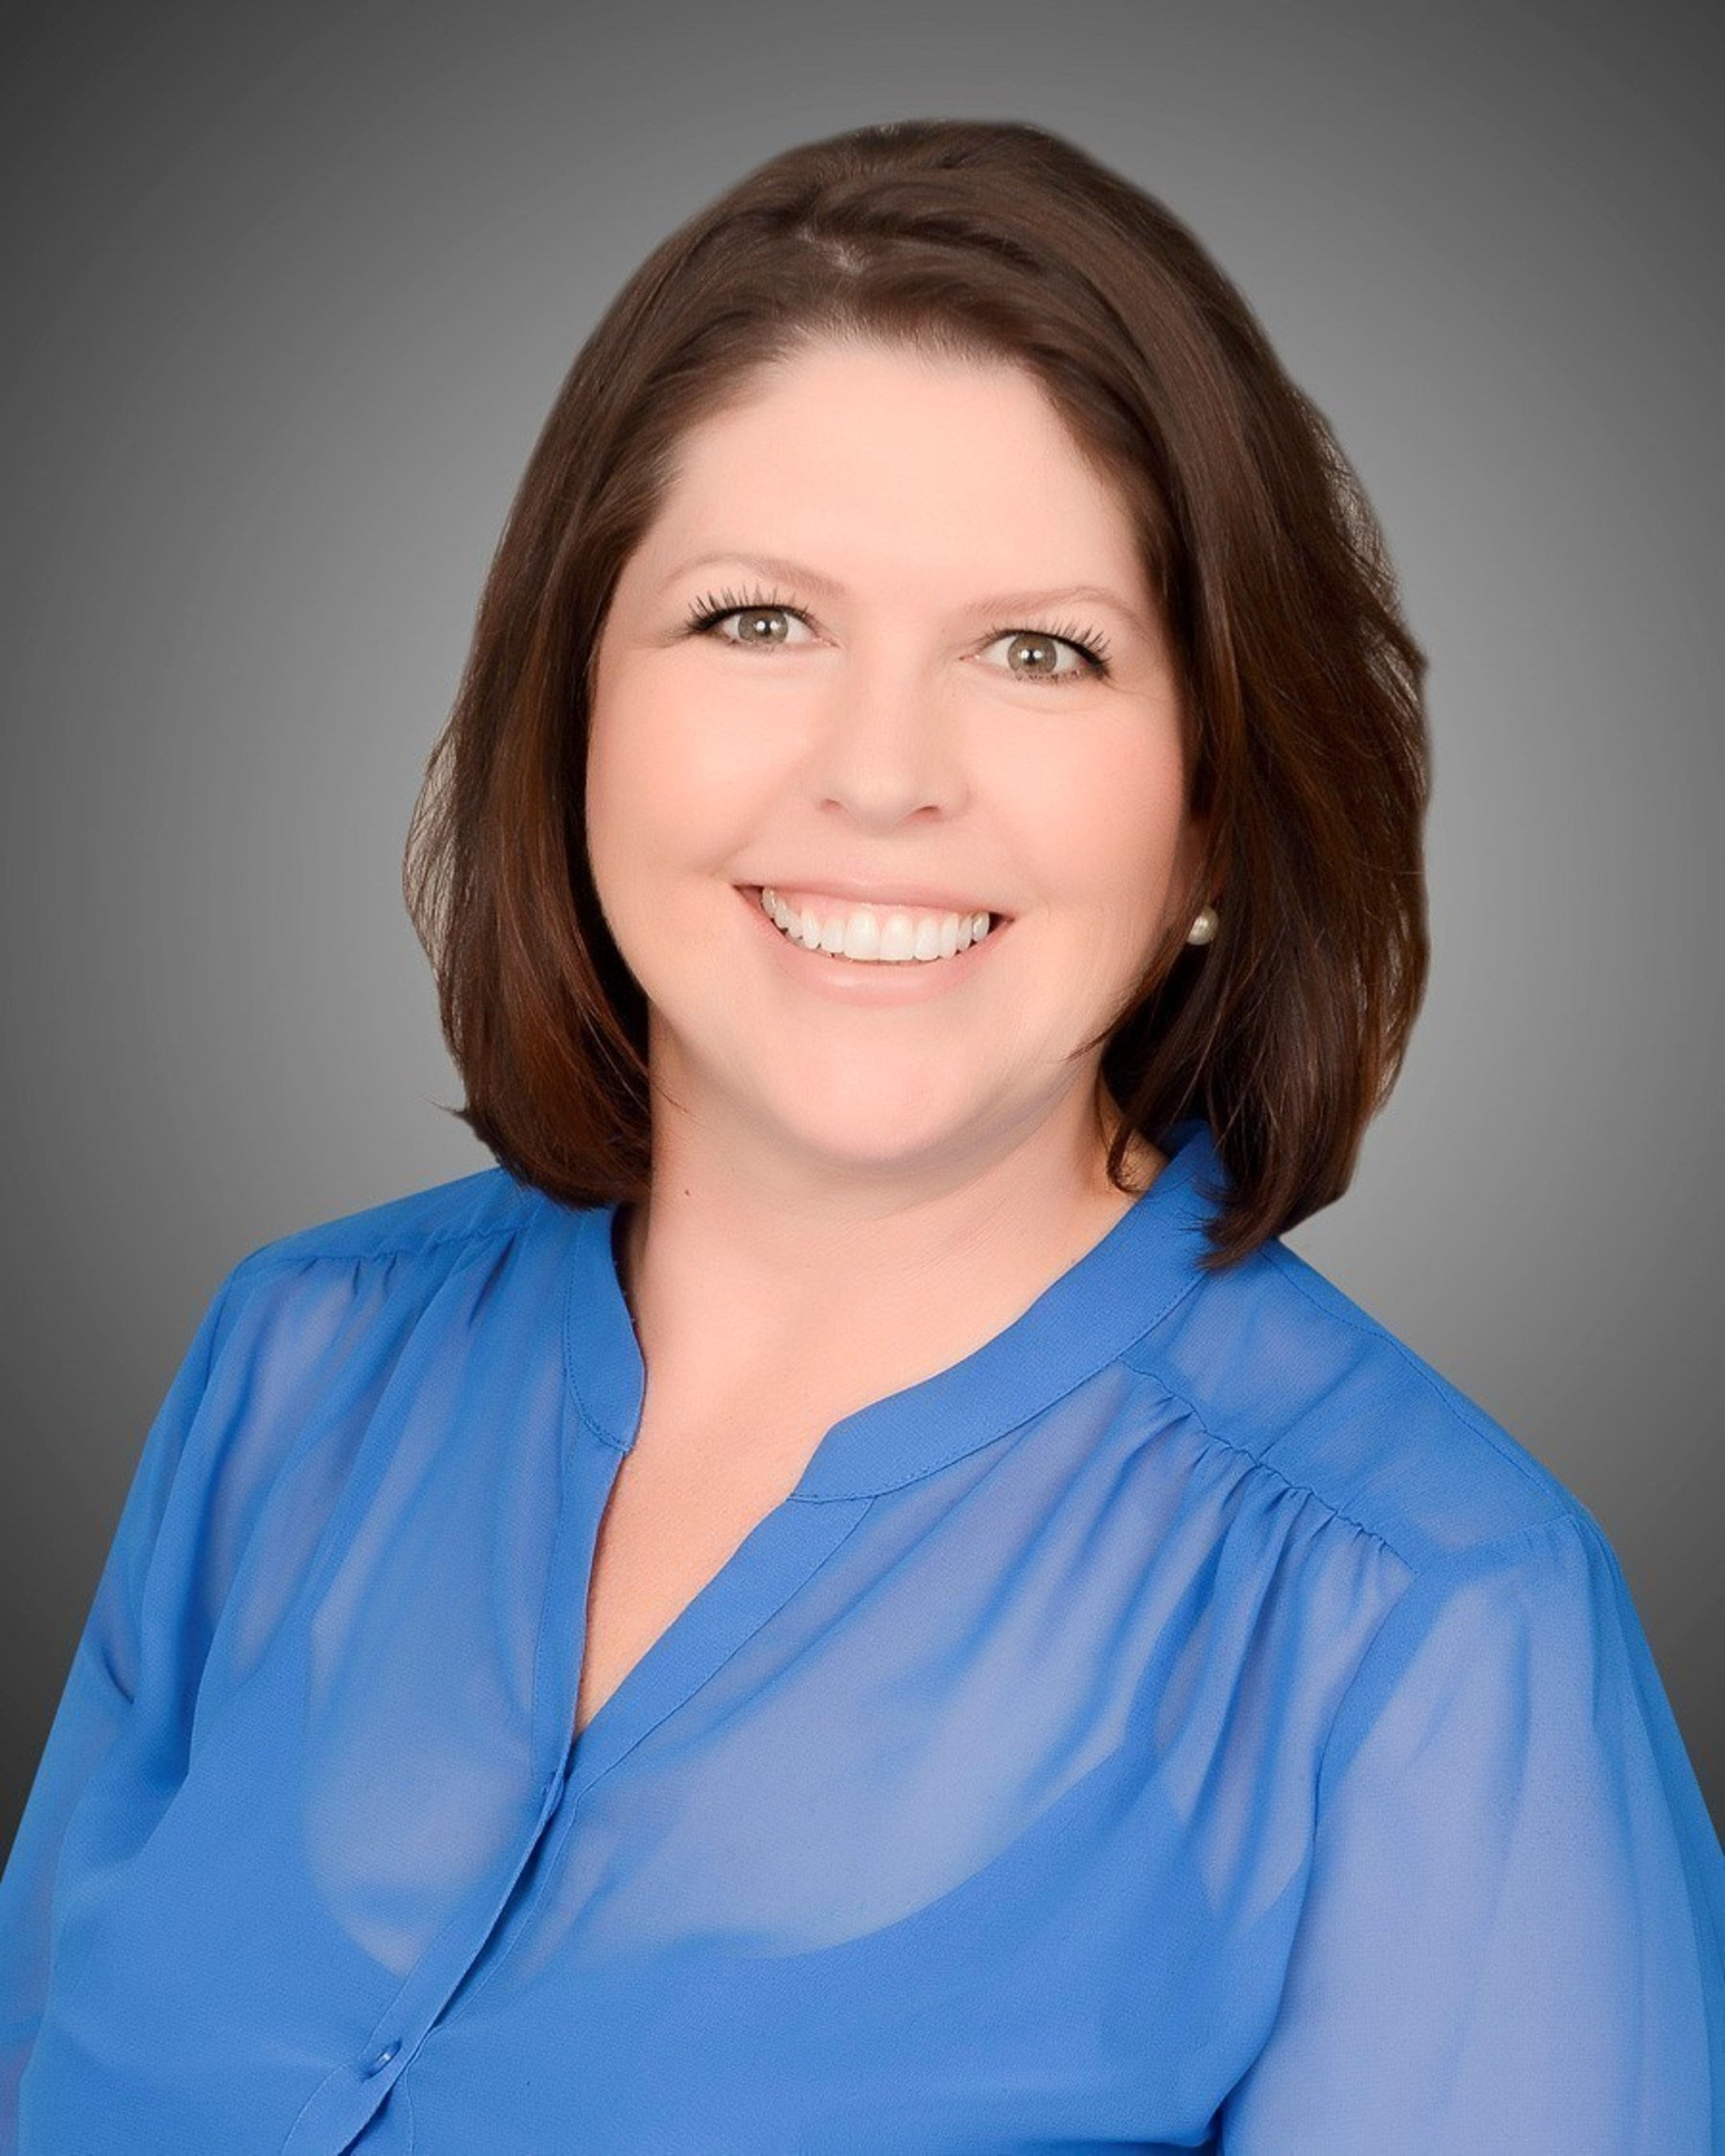 Kim Harland, PrimeLending Area Manager